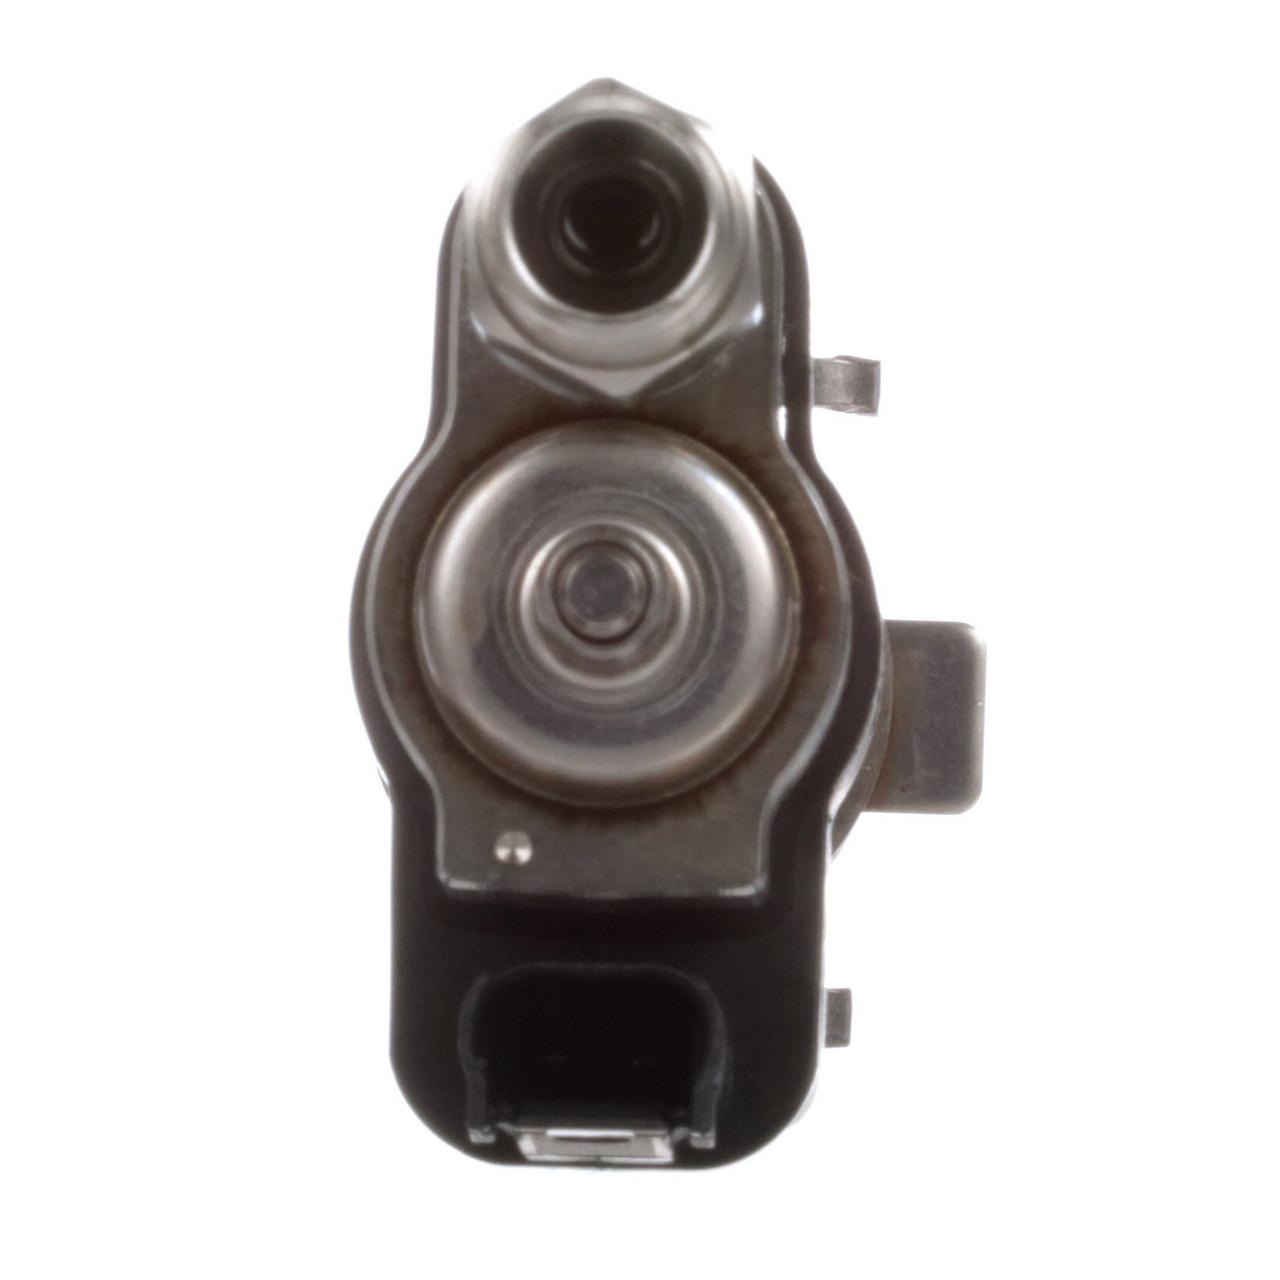 BMW Fuel Injector (Set of 6 Index 12) - Genuine BMW 13538616079KT